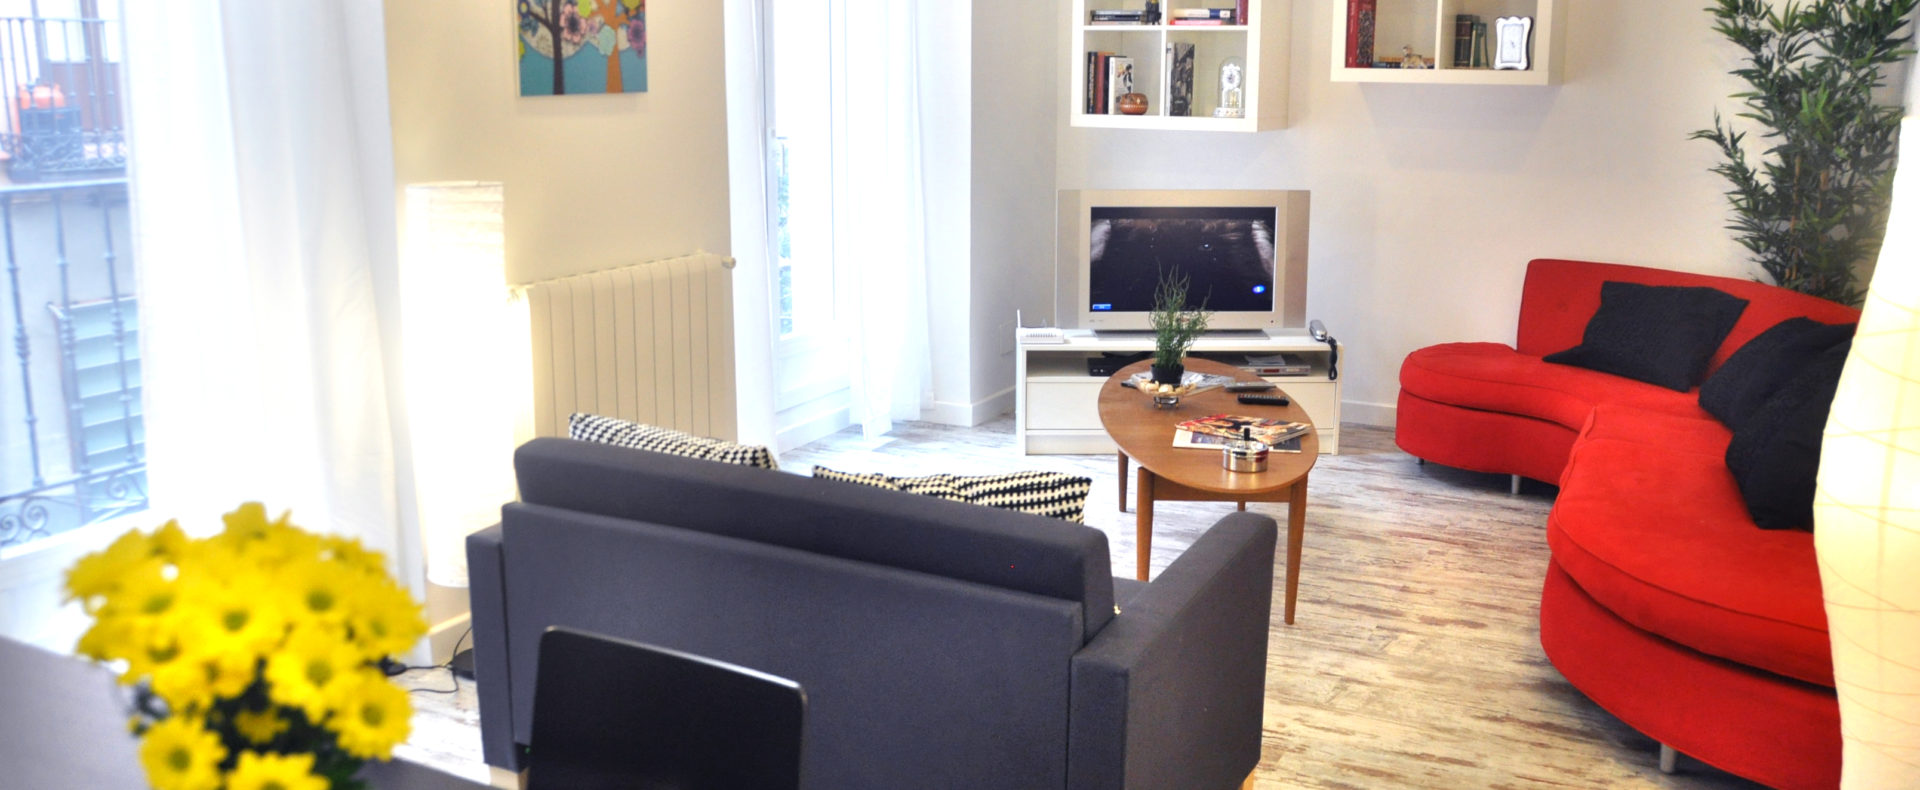 Alquiler de apartamentos por d as en madrid rentapart magazine - Habitacion por dias madrid ...